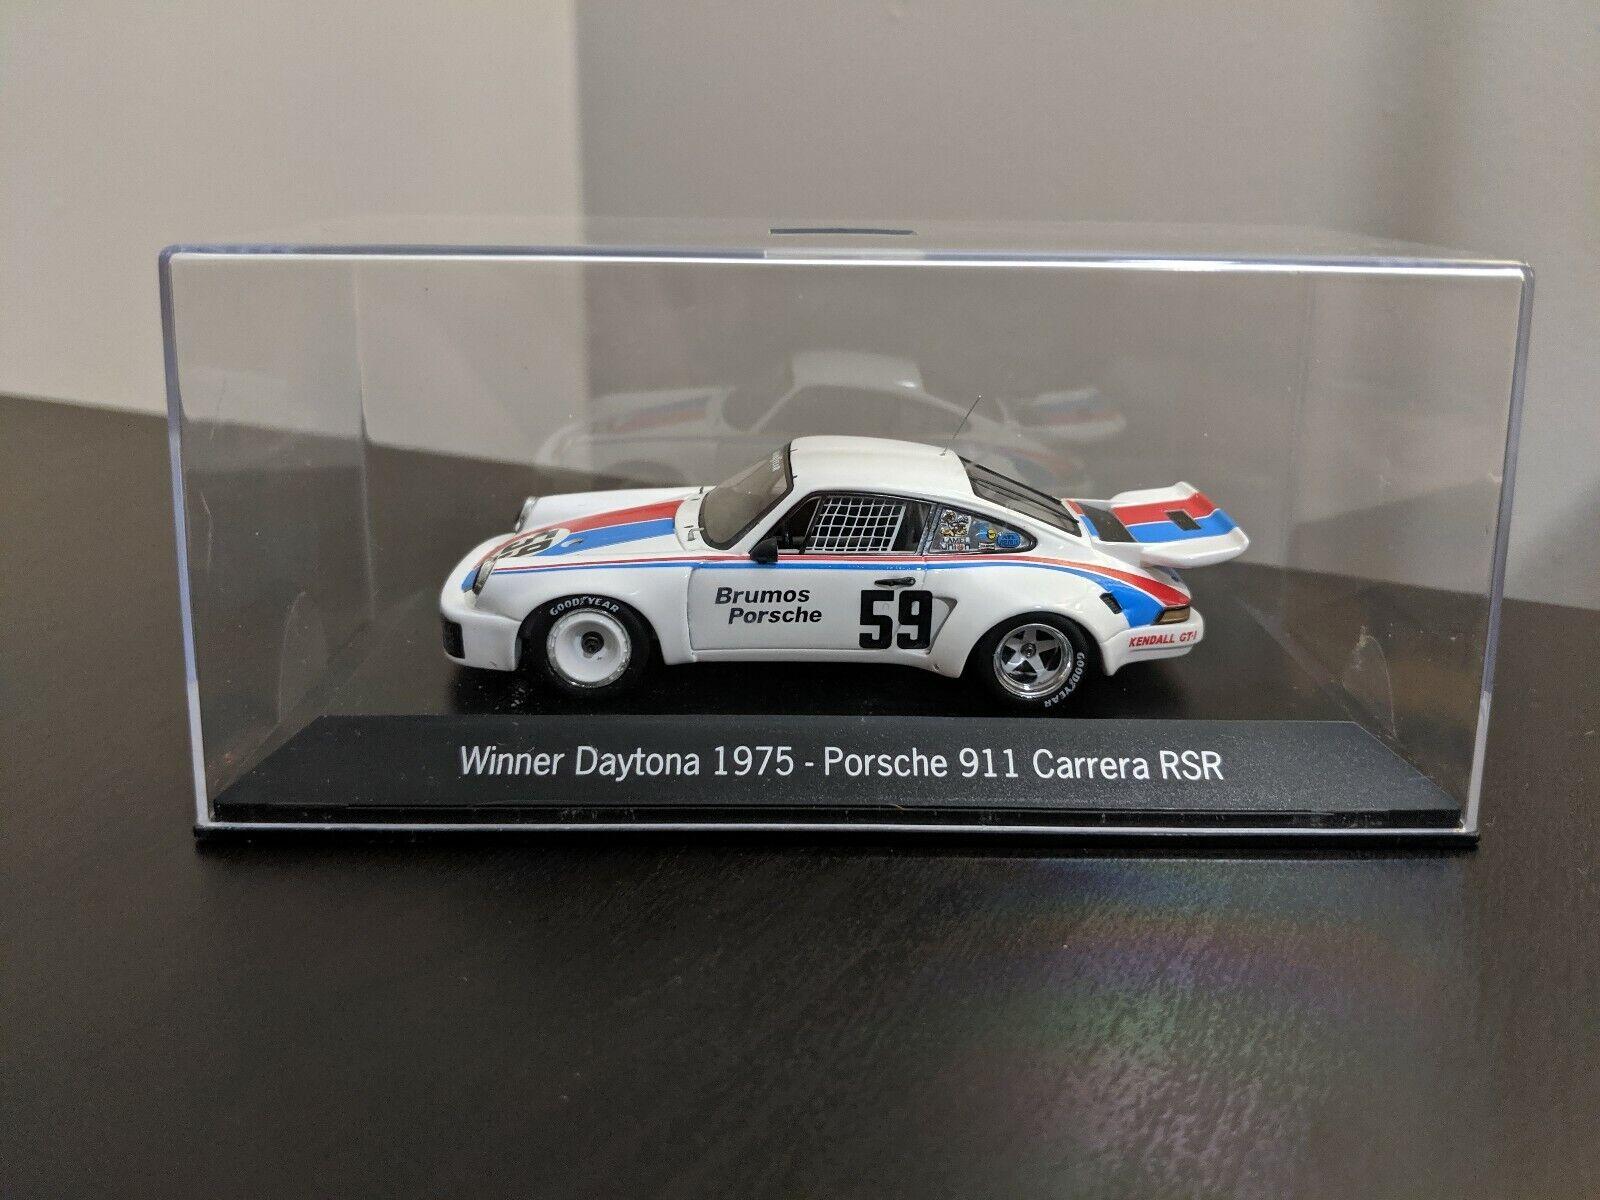 RARE Porsche 911 Carrera RSR Winner Daytona 1975  59 1 43